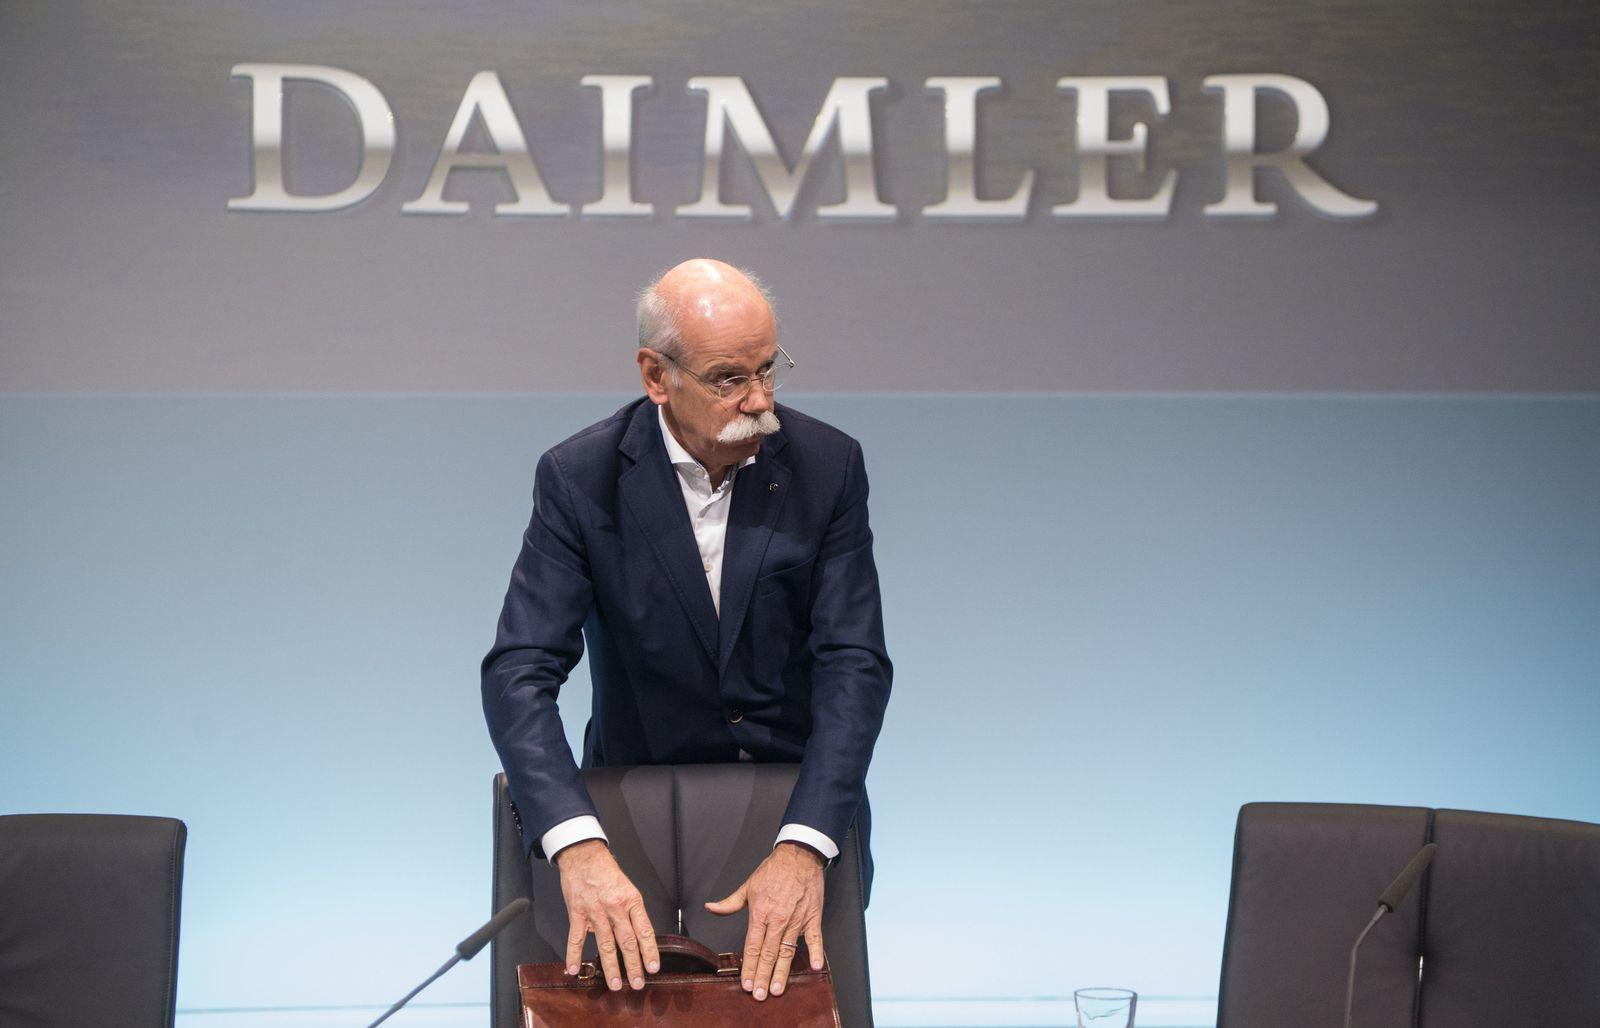 Daimler AG - Jahrespressekonferenz